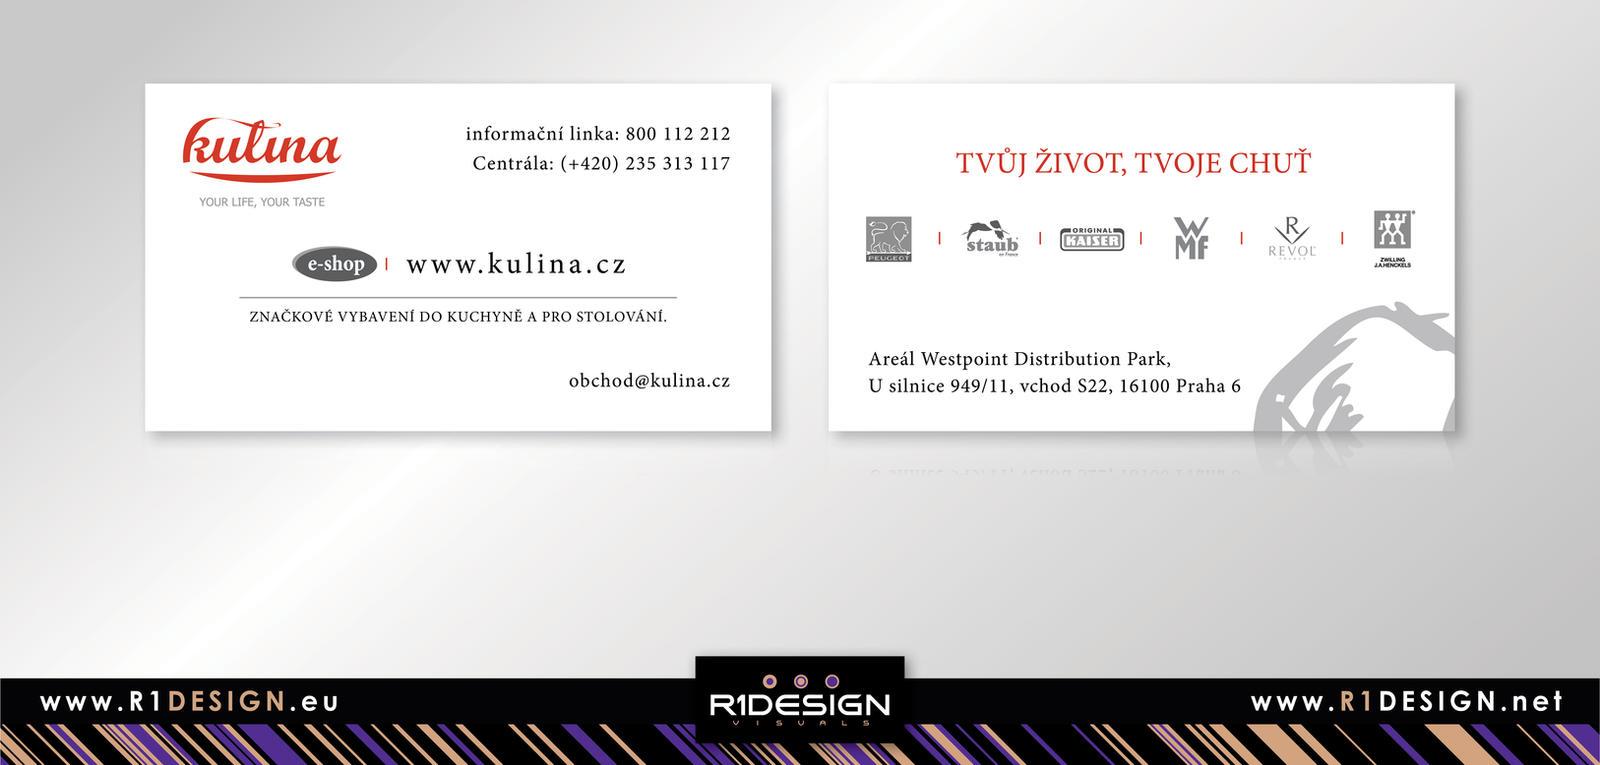 KULINA : e-shop, kitchenware - business card by R1Design on DeviantArt